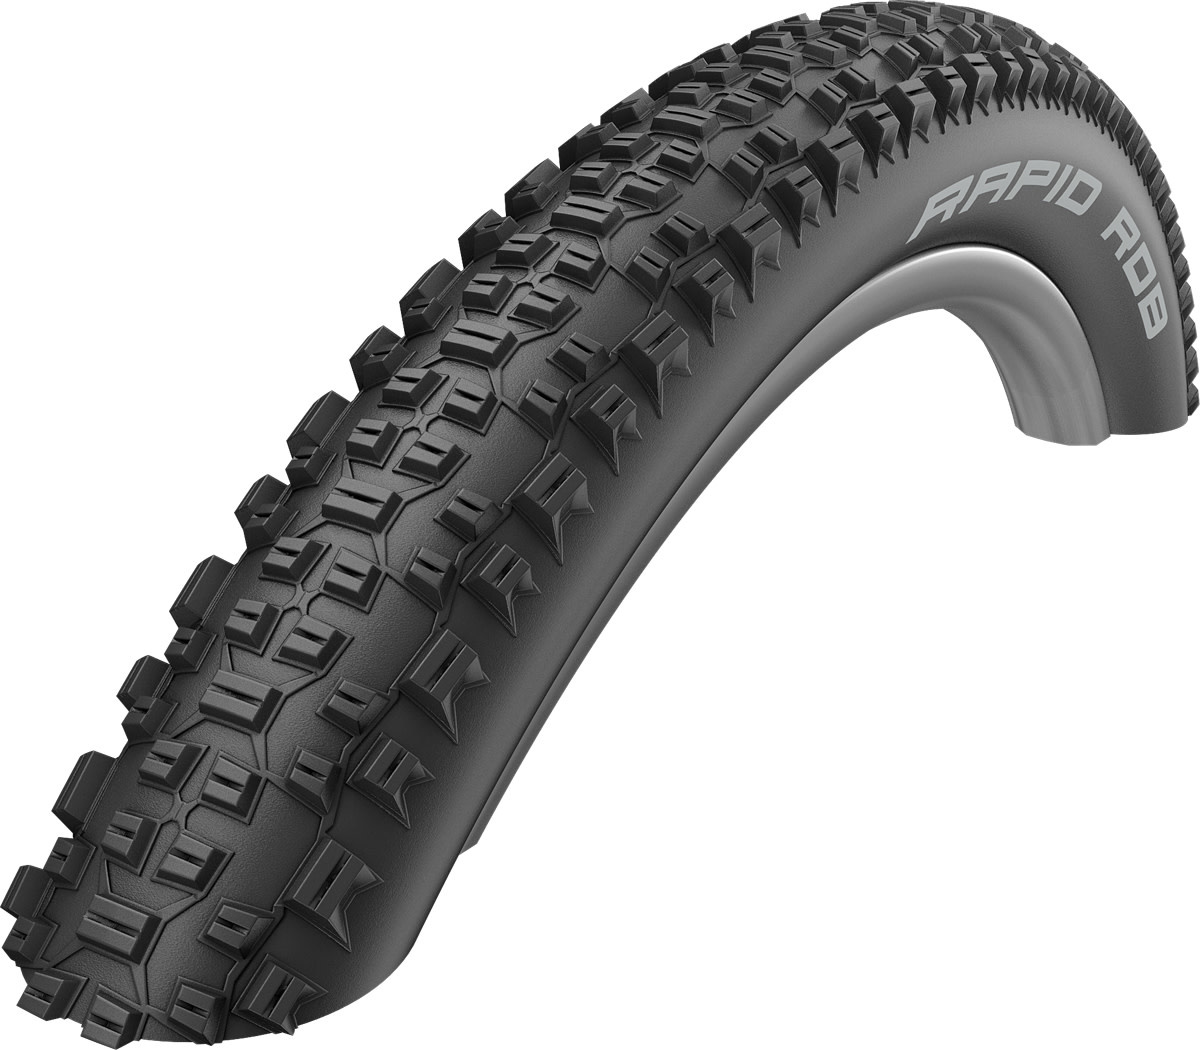 Schwalbe Schwalbe Rapid Rob Active Line All Terrain Tyre in Black - 29 x 2.10